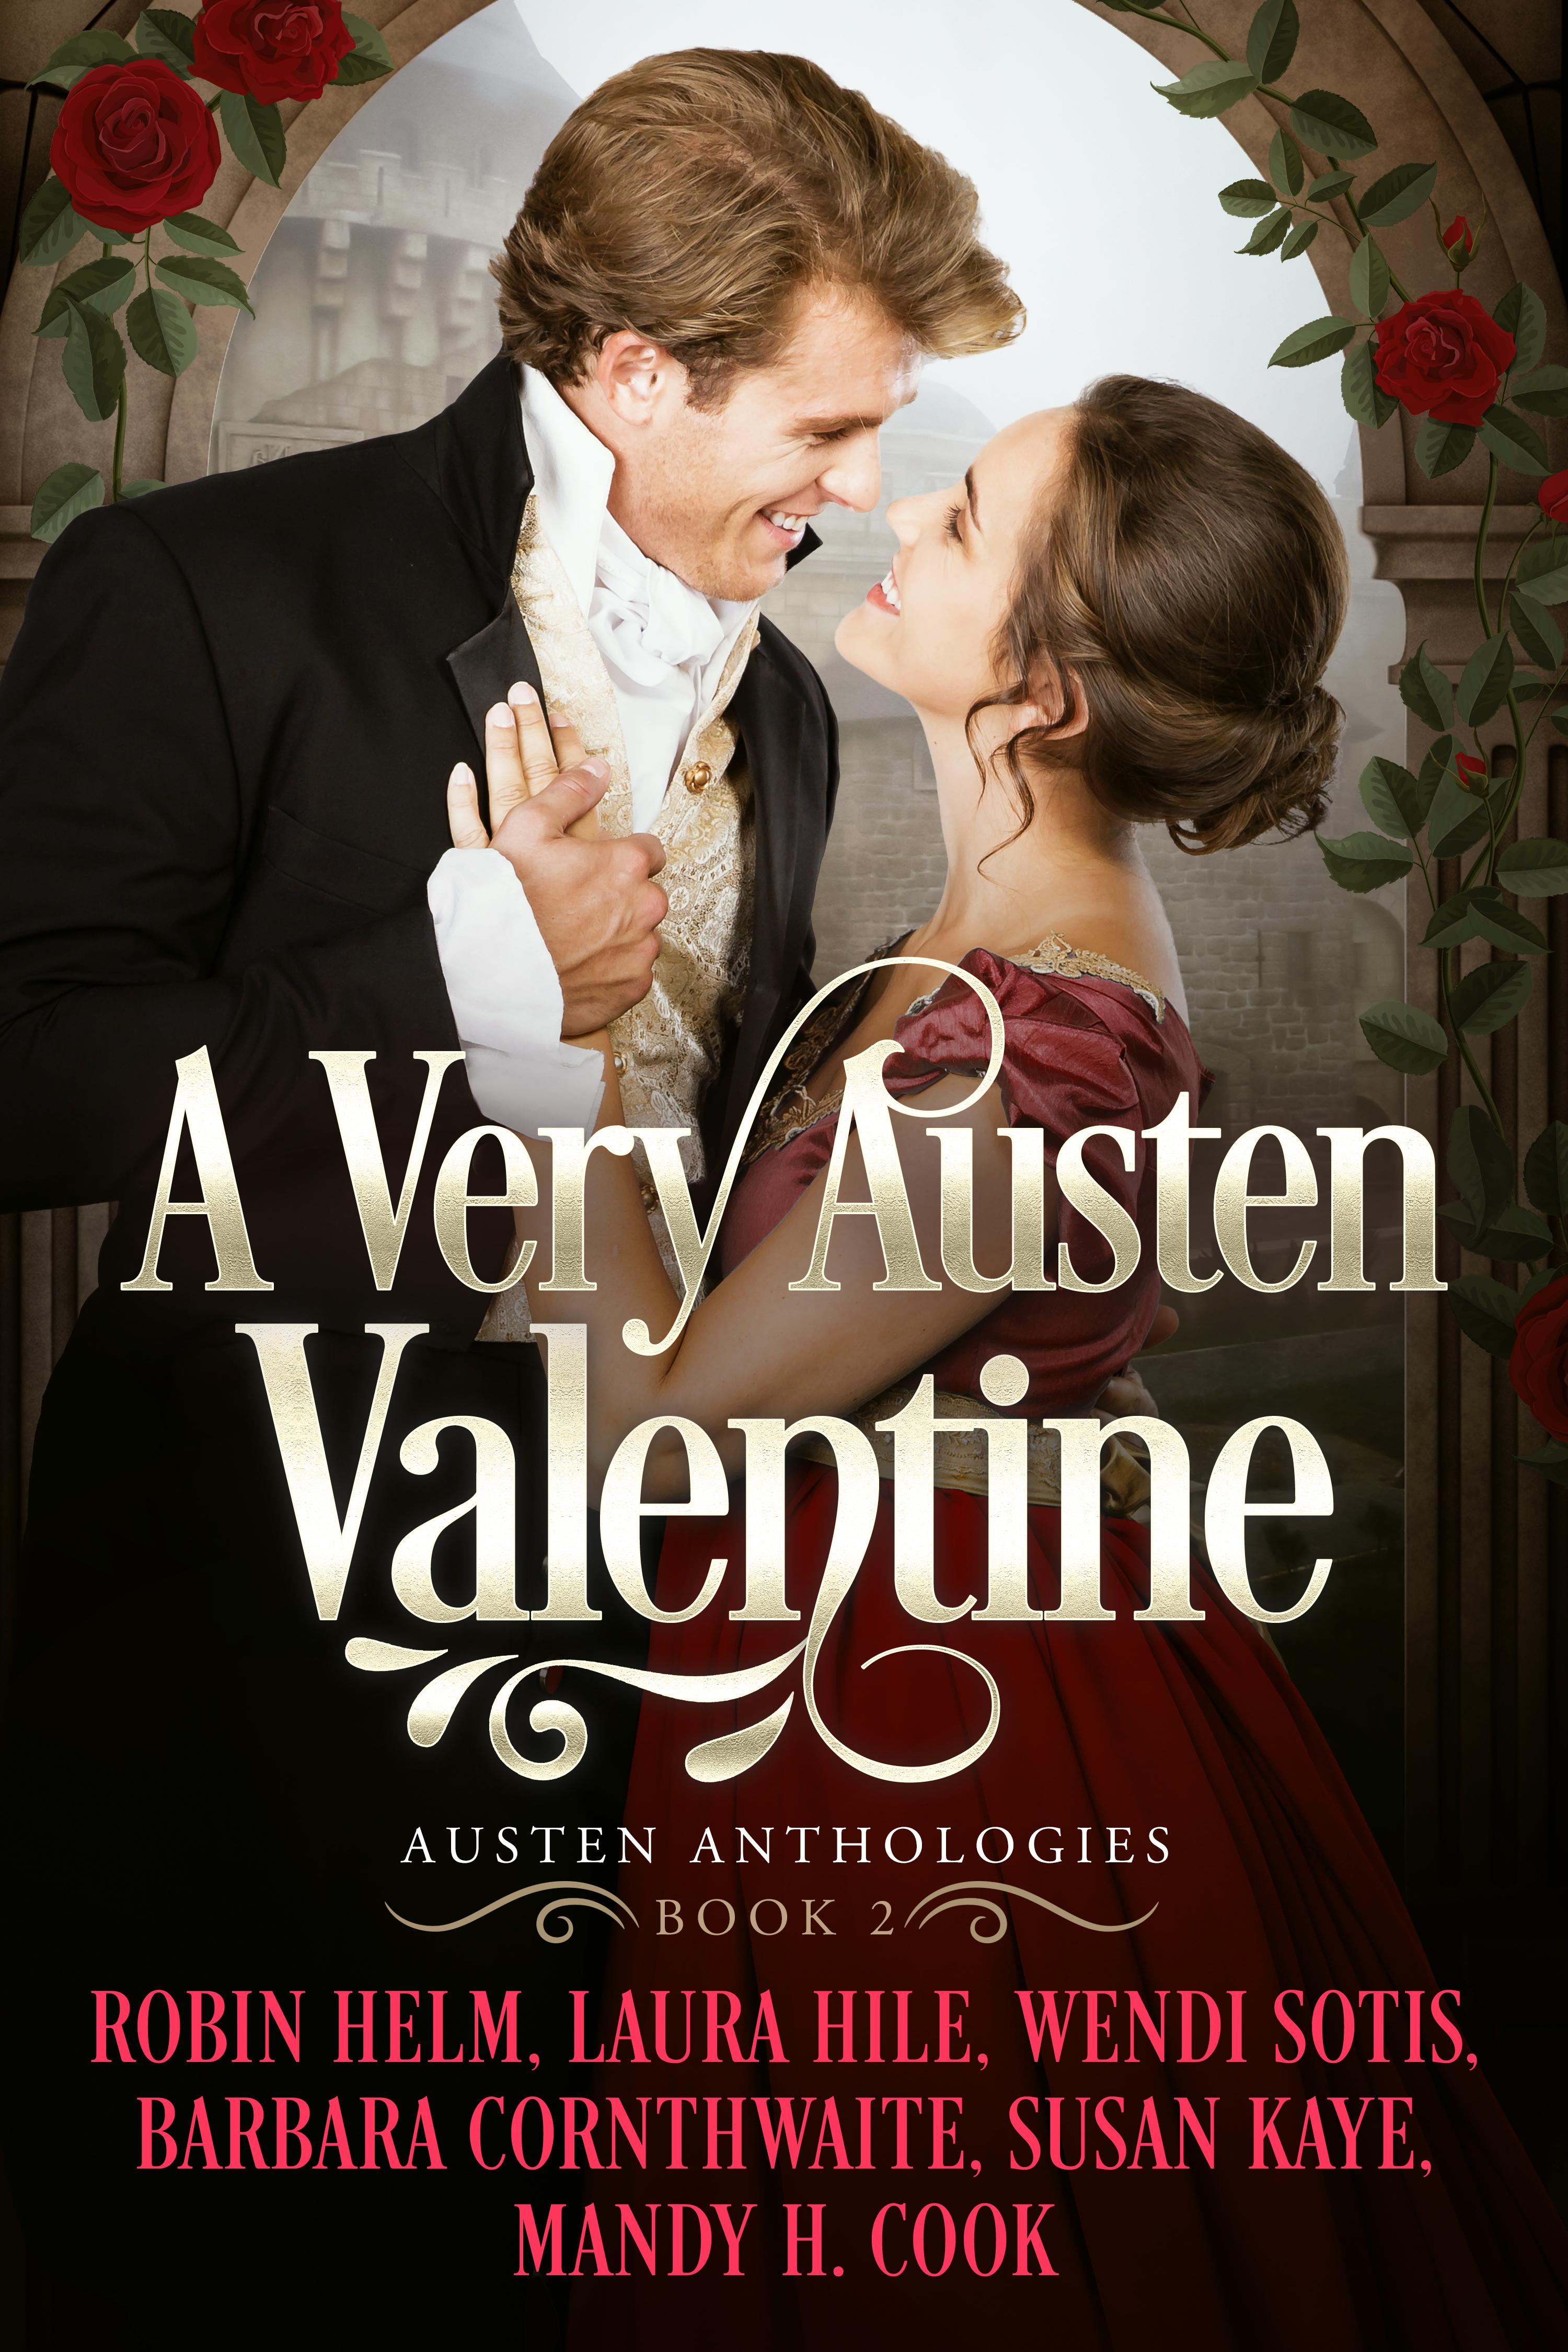 a very austen valentine book 2 - ebook large